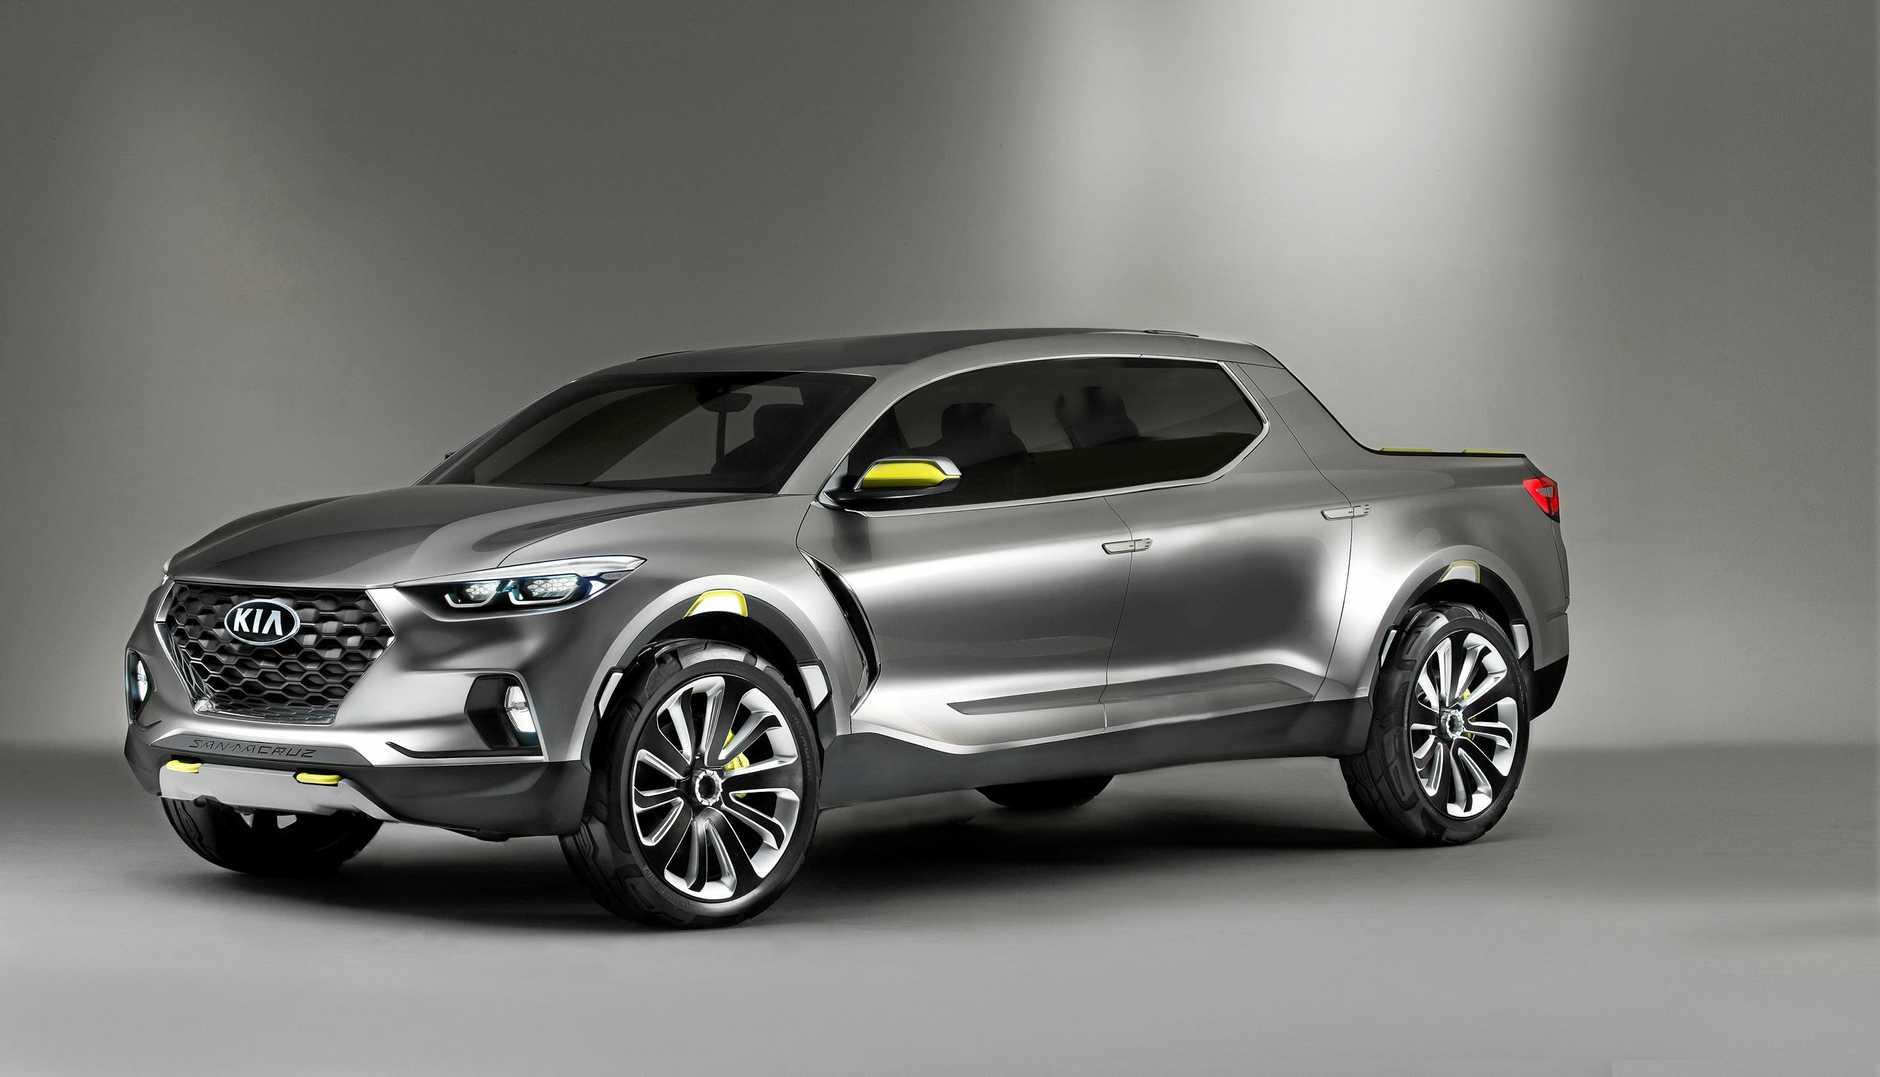 An artistic impression of a dual cab Kia ute, based off the Santa Cruz Crossover Truck Concept.